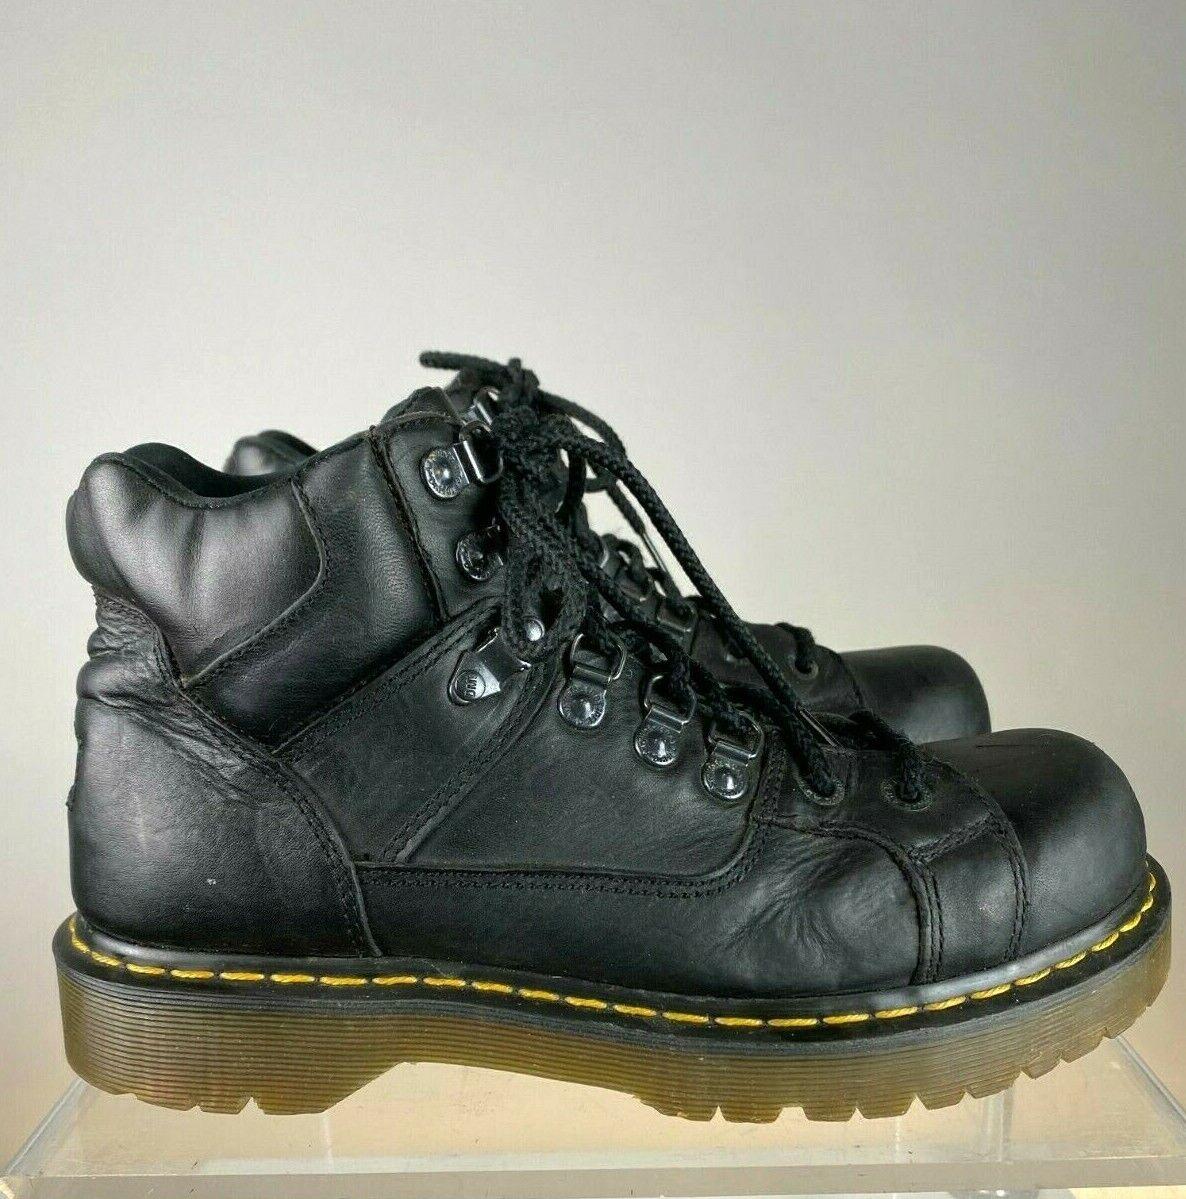 DR MARTEN WORK BOOTS STEEL TOE IN BLACK LEATHER - US10M/ UK9/ EUR43 -21/106